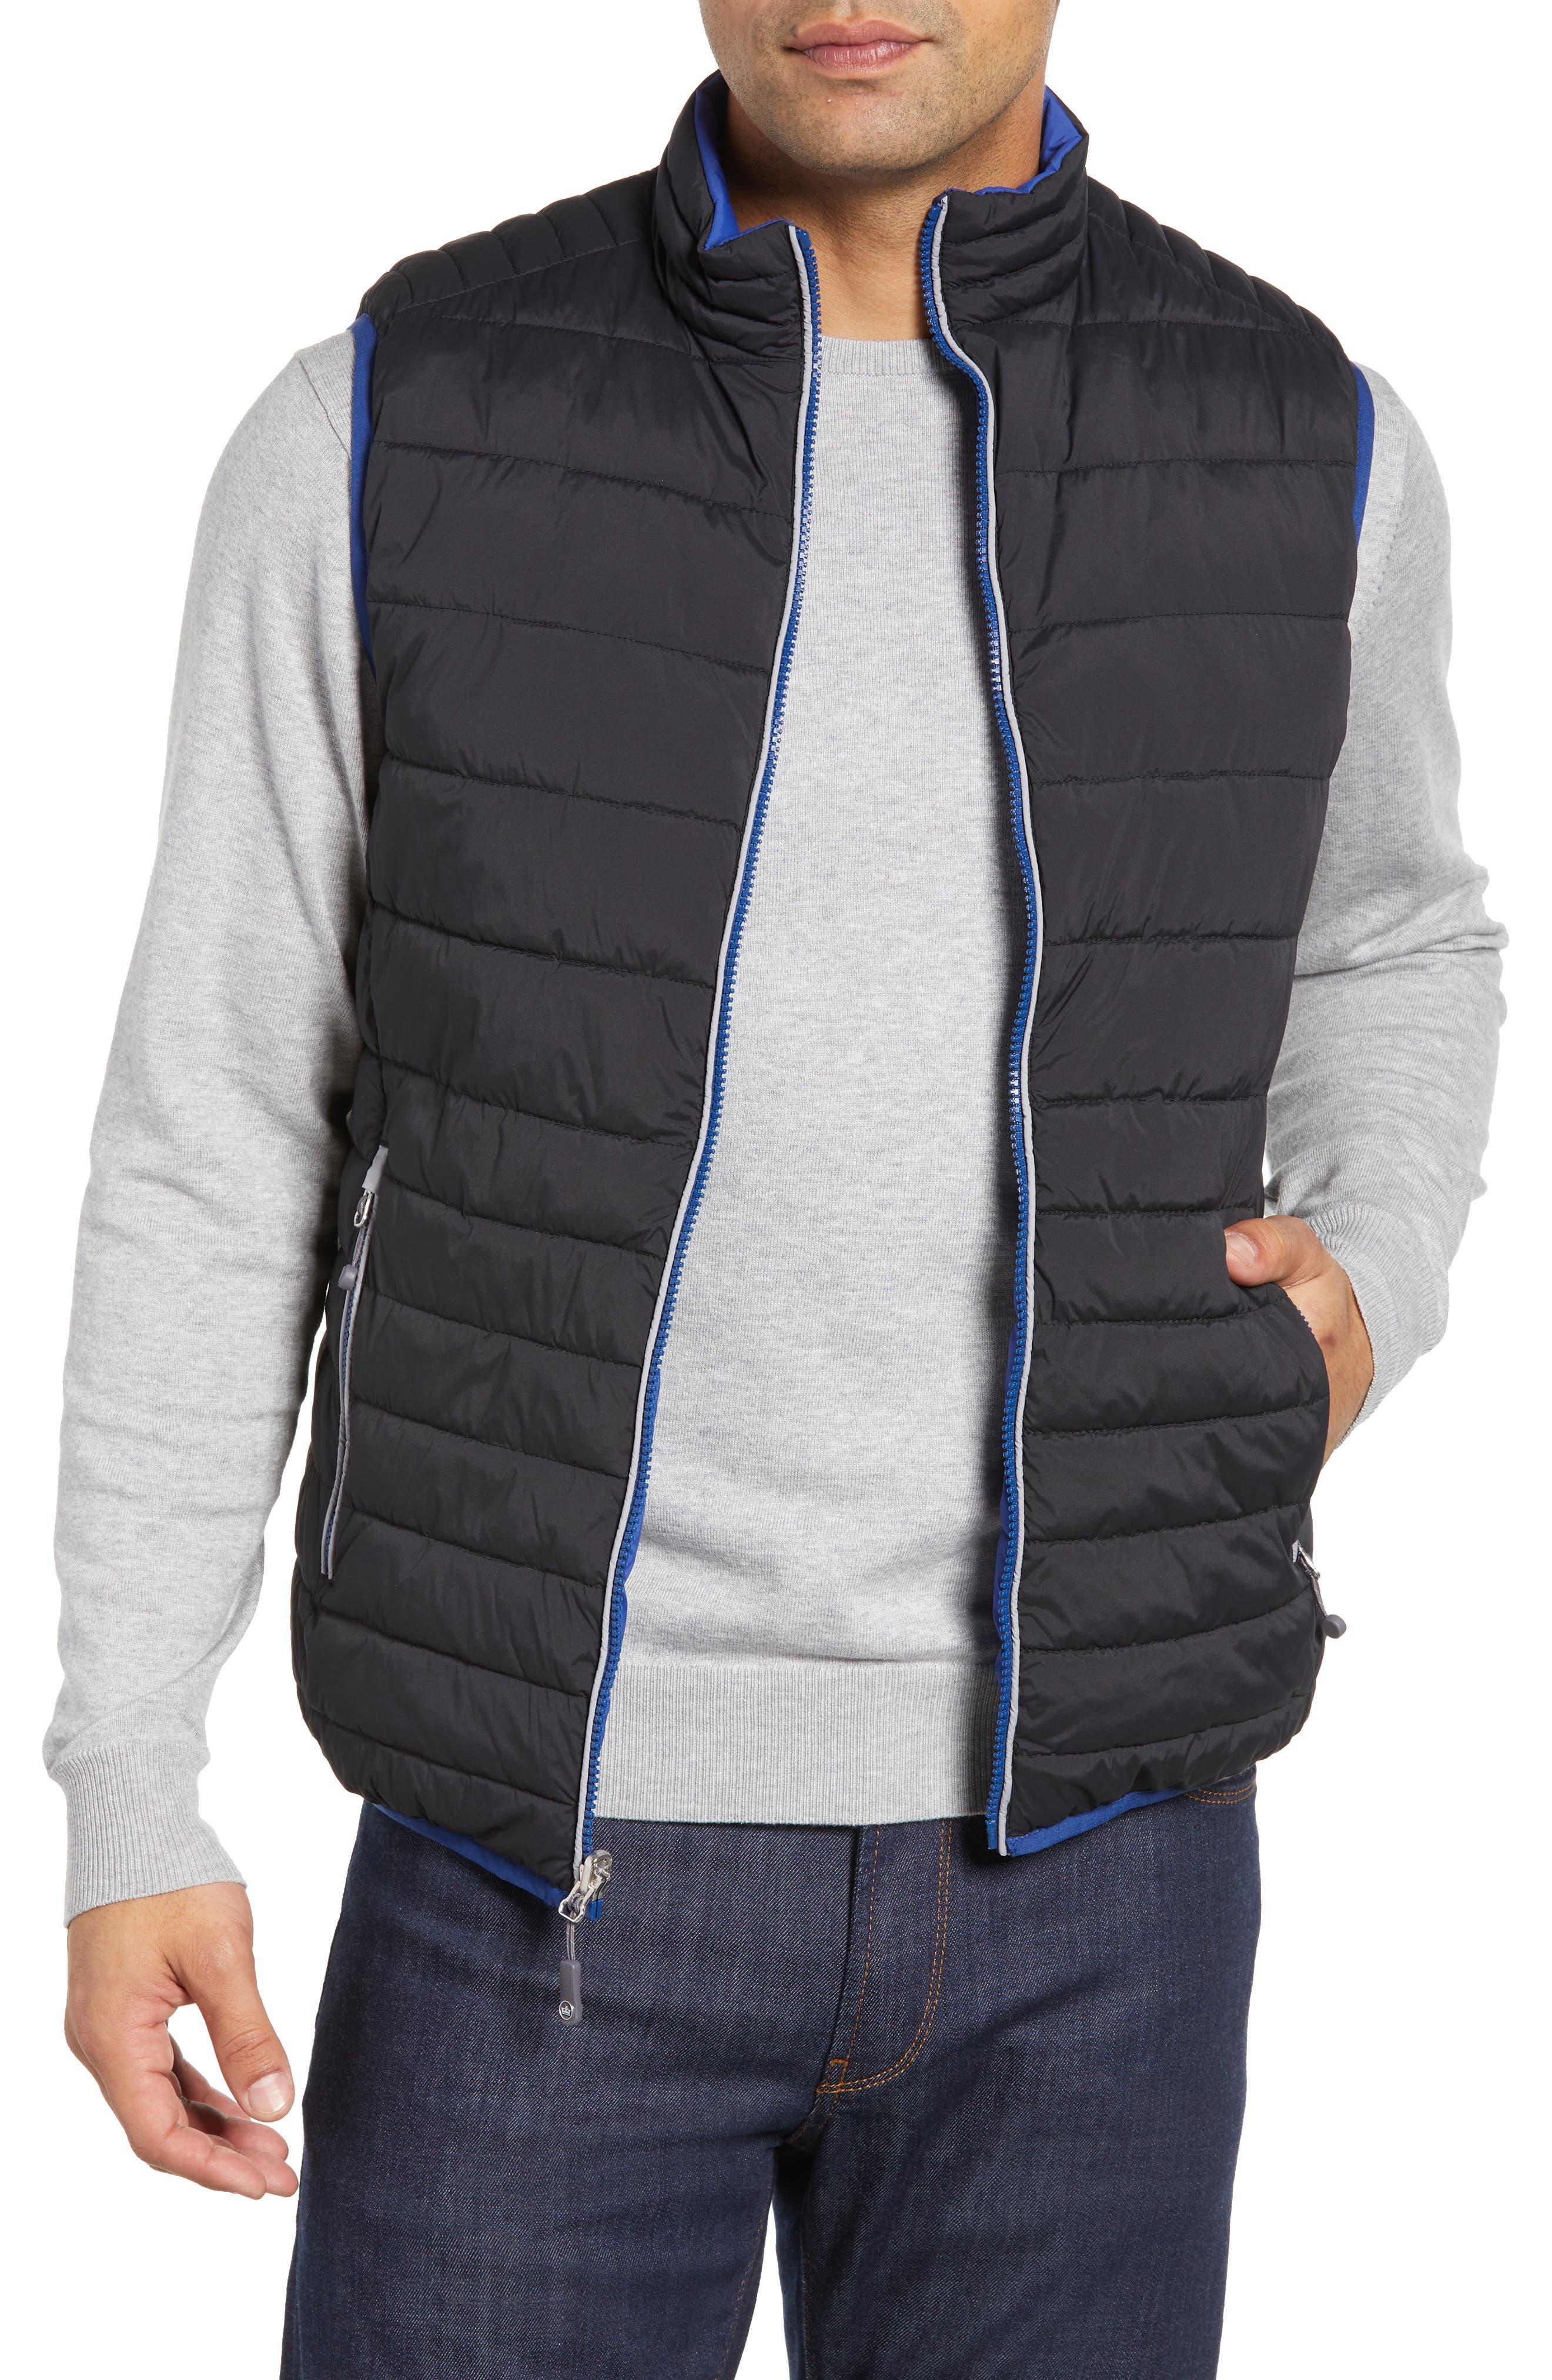 PETER MILLAR, Crown Elite Reversible Vest, Main thumbnail 1, color, BLACK/SAIL